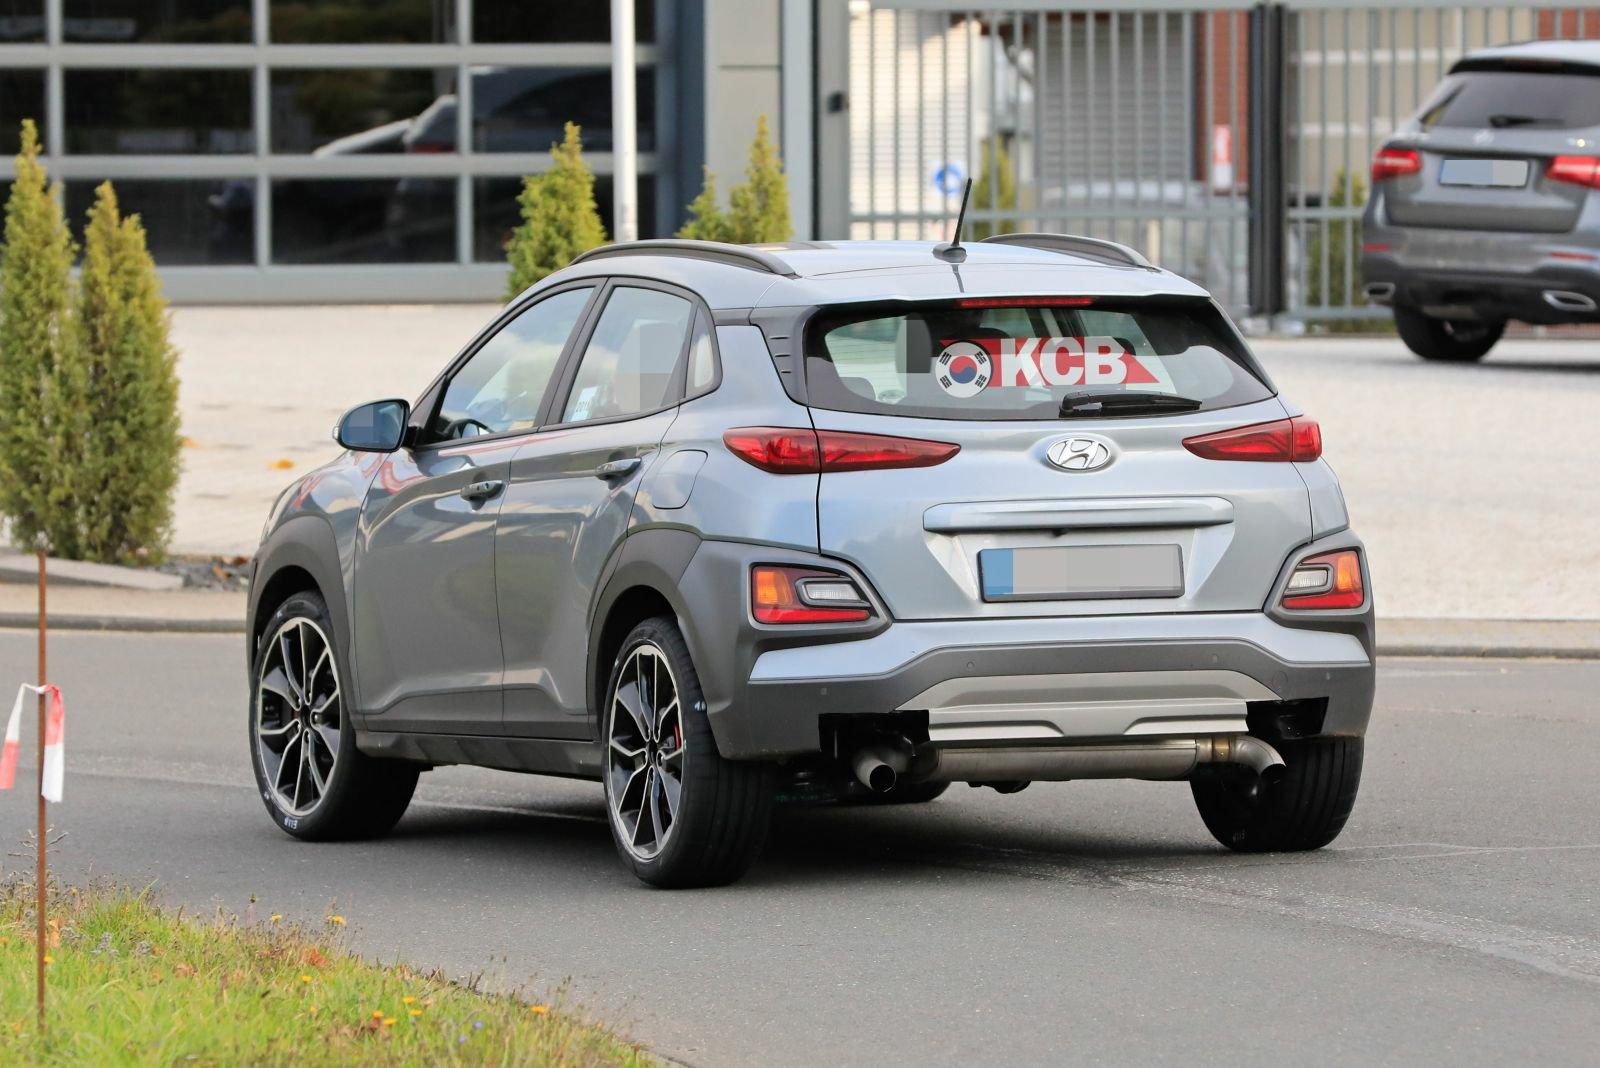 Hyundai to Expand N Brand to SUVs and EVs